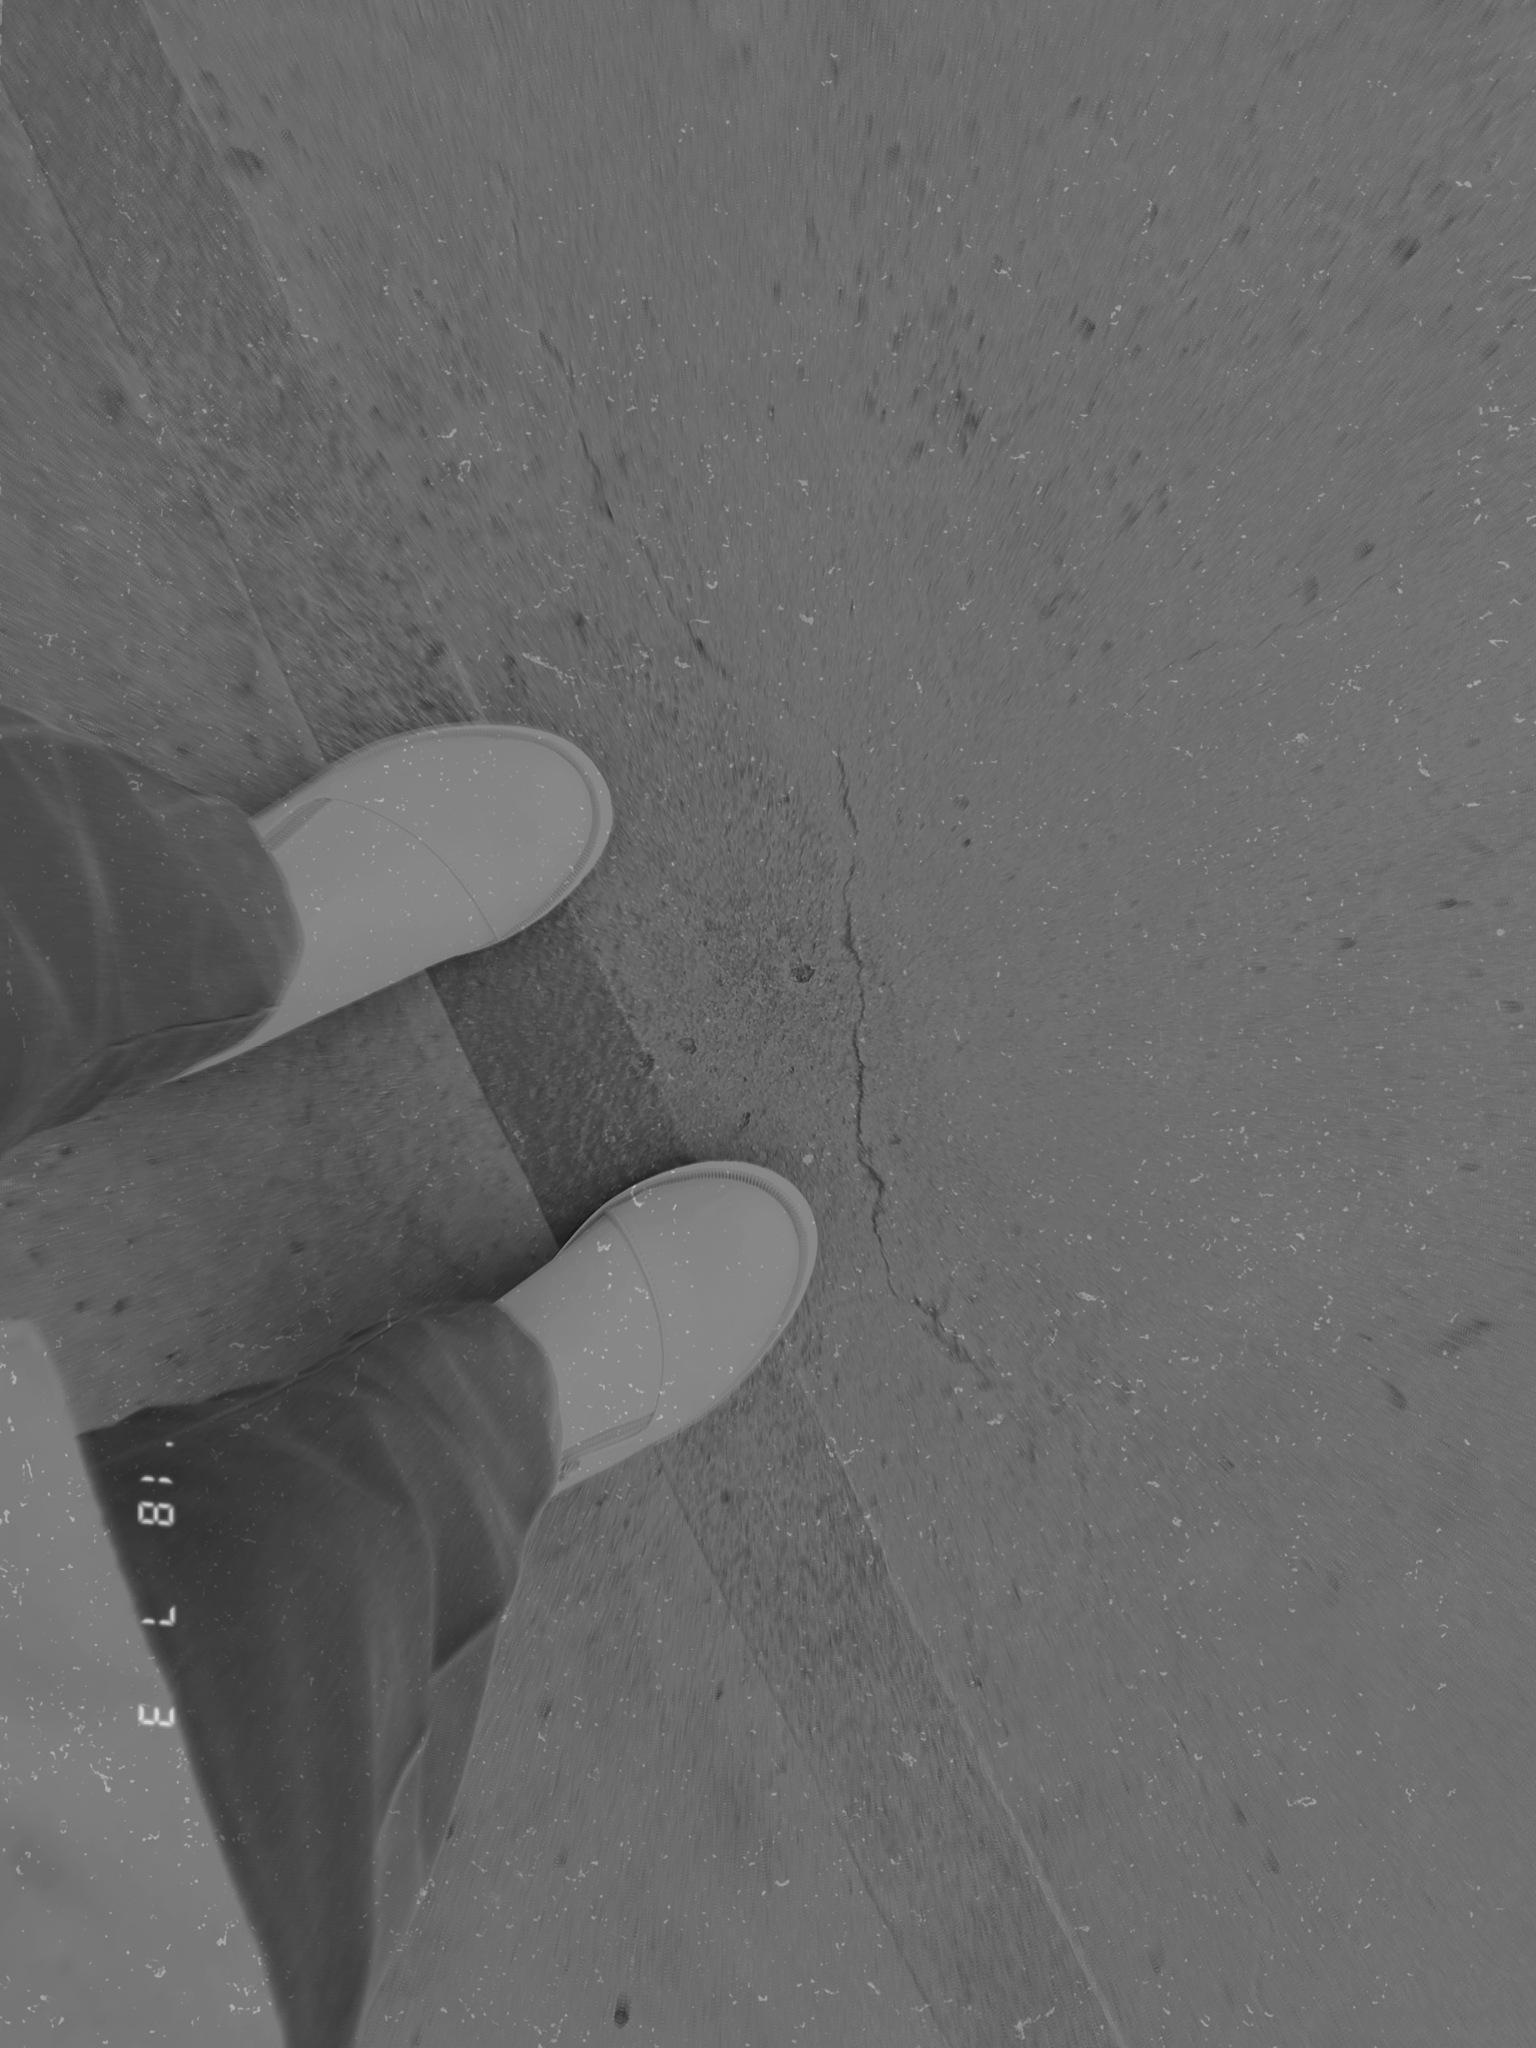 WALK by Ije T. Tyas